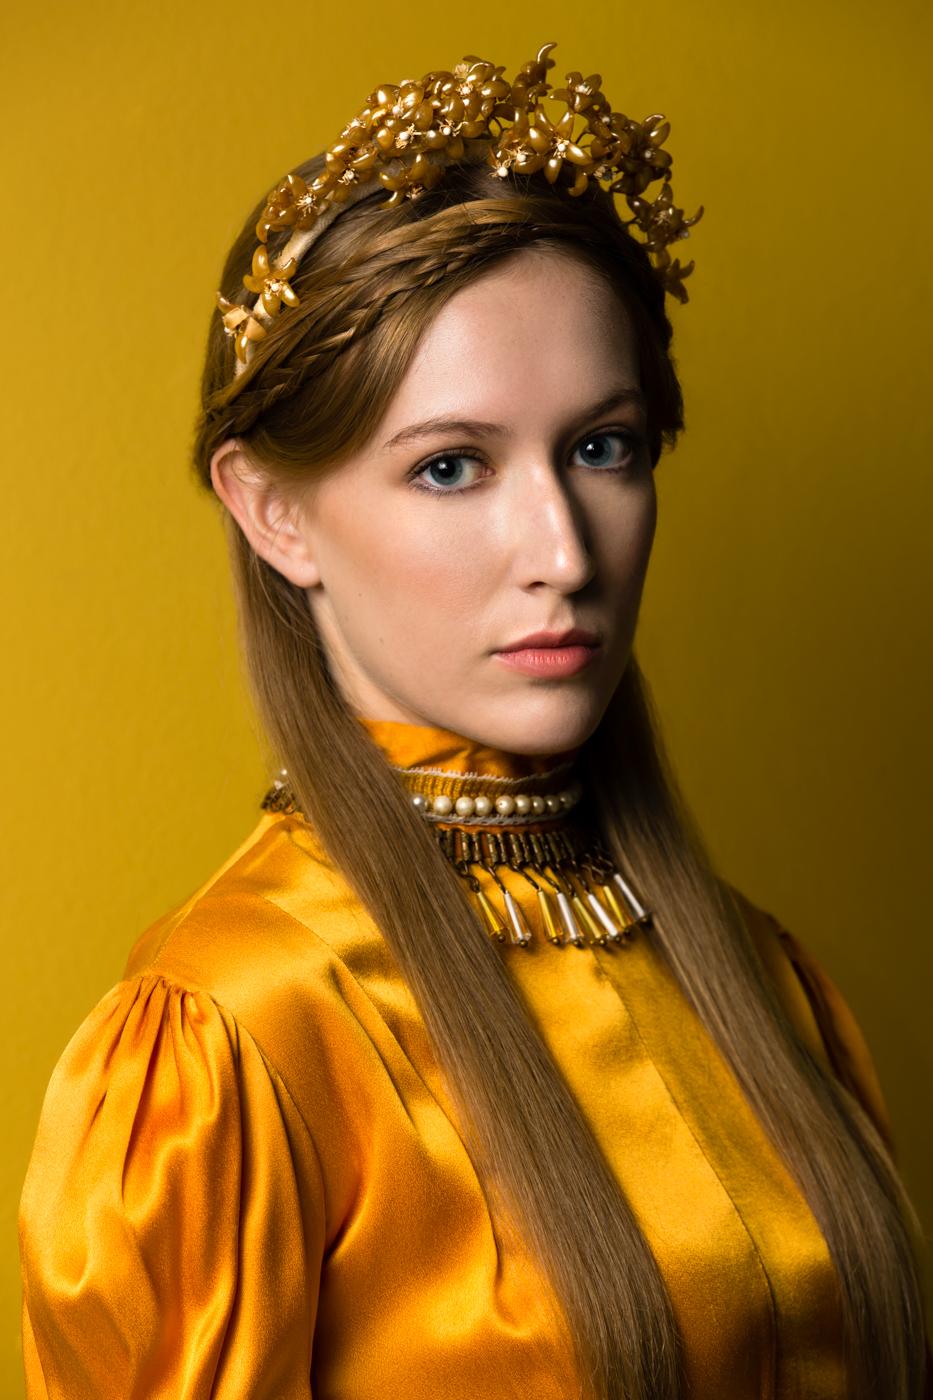 game-of-thrones-GOT-makeup-flower-crown-orlando-studio.jpg